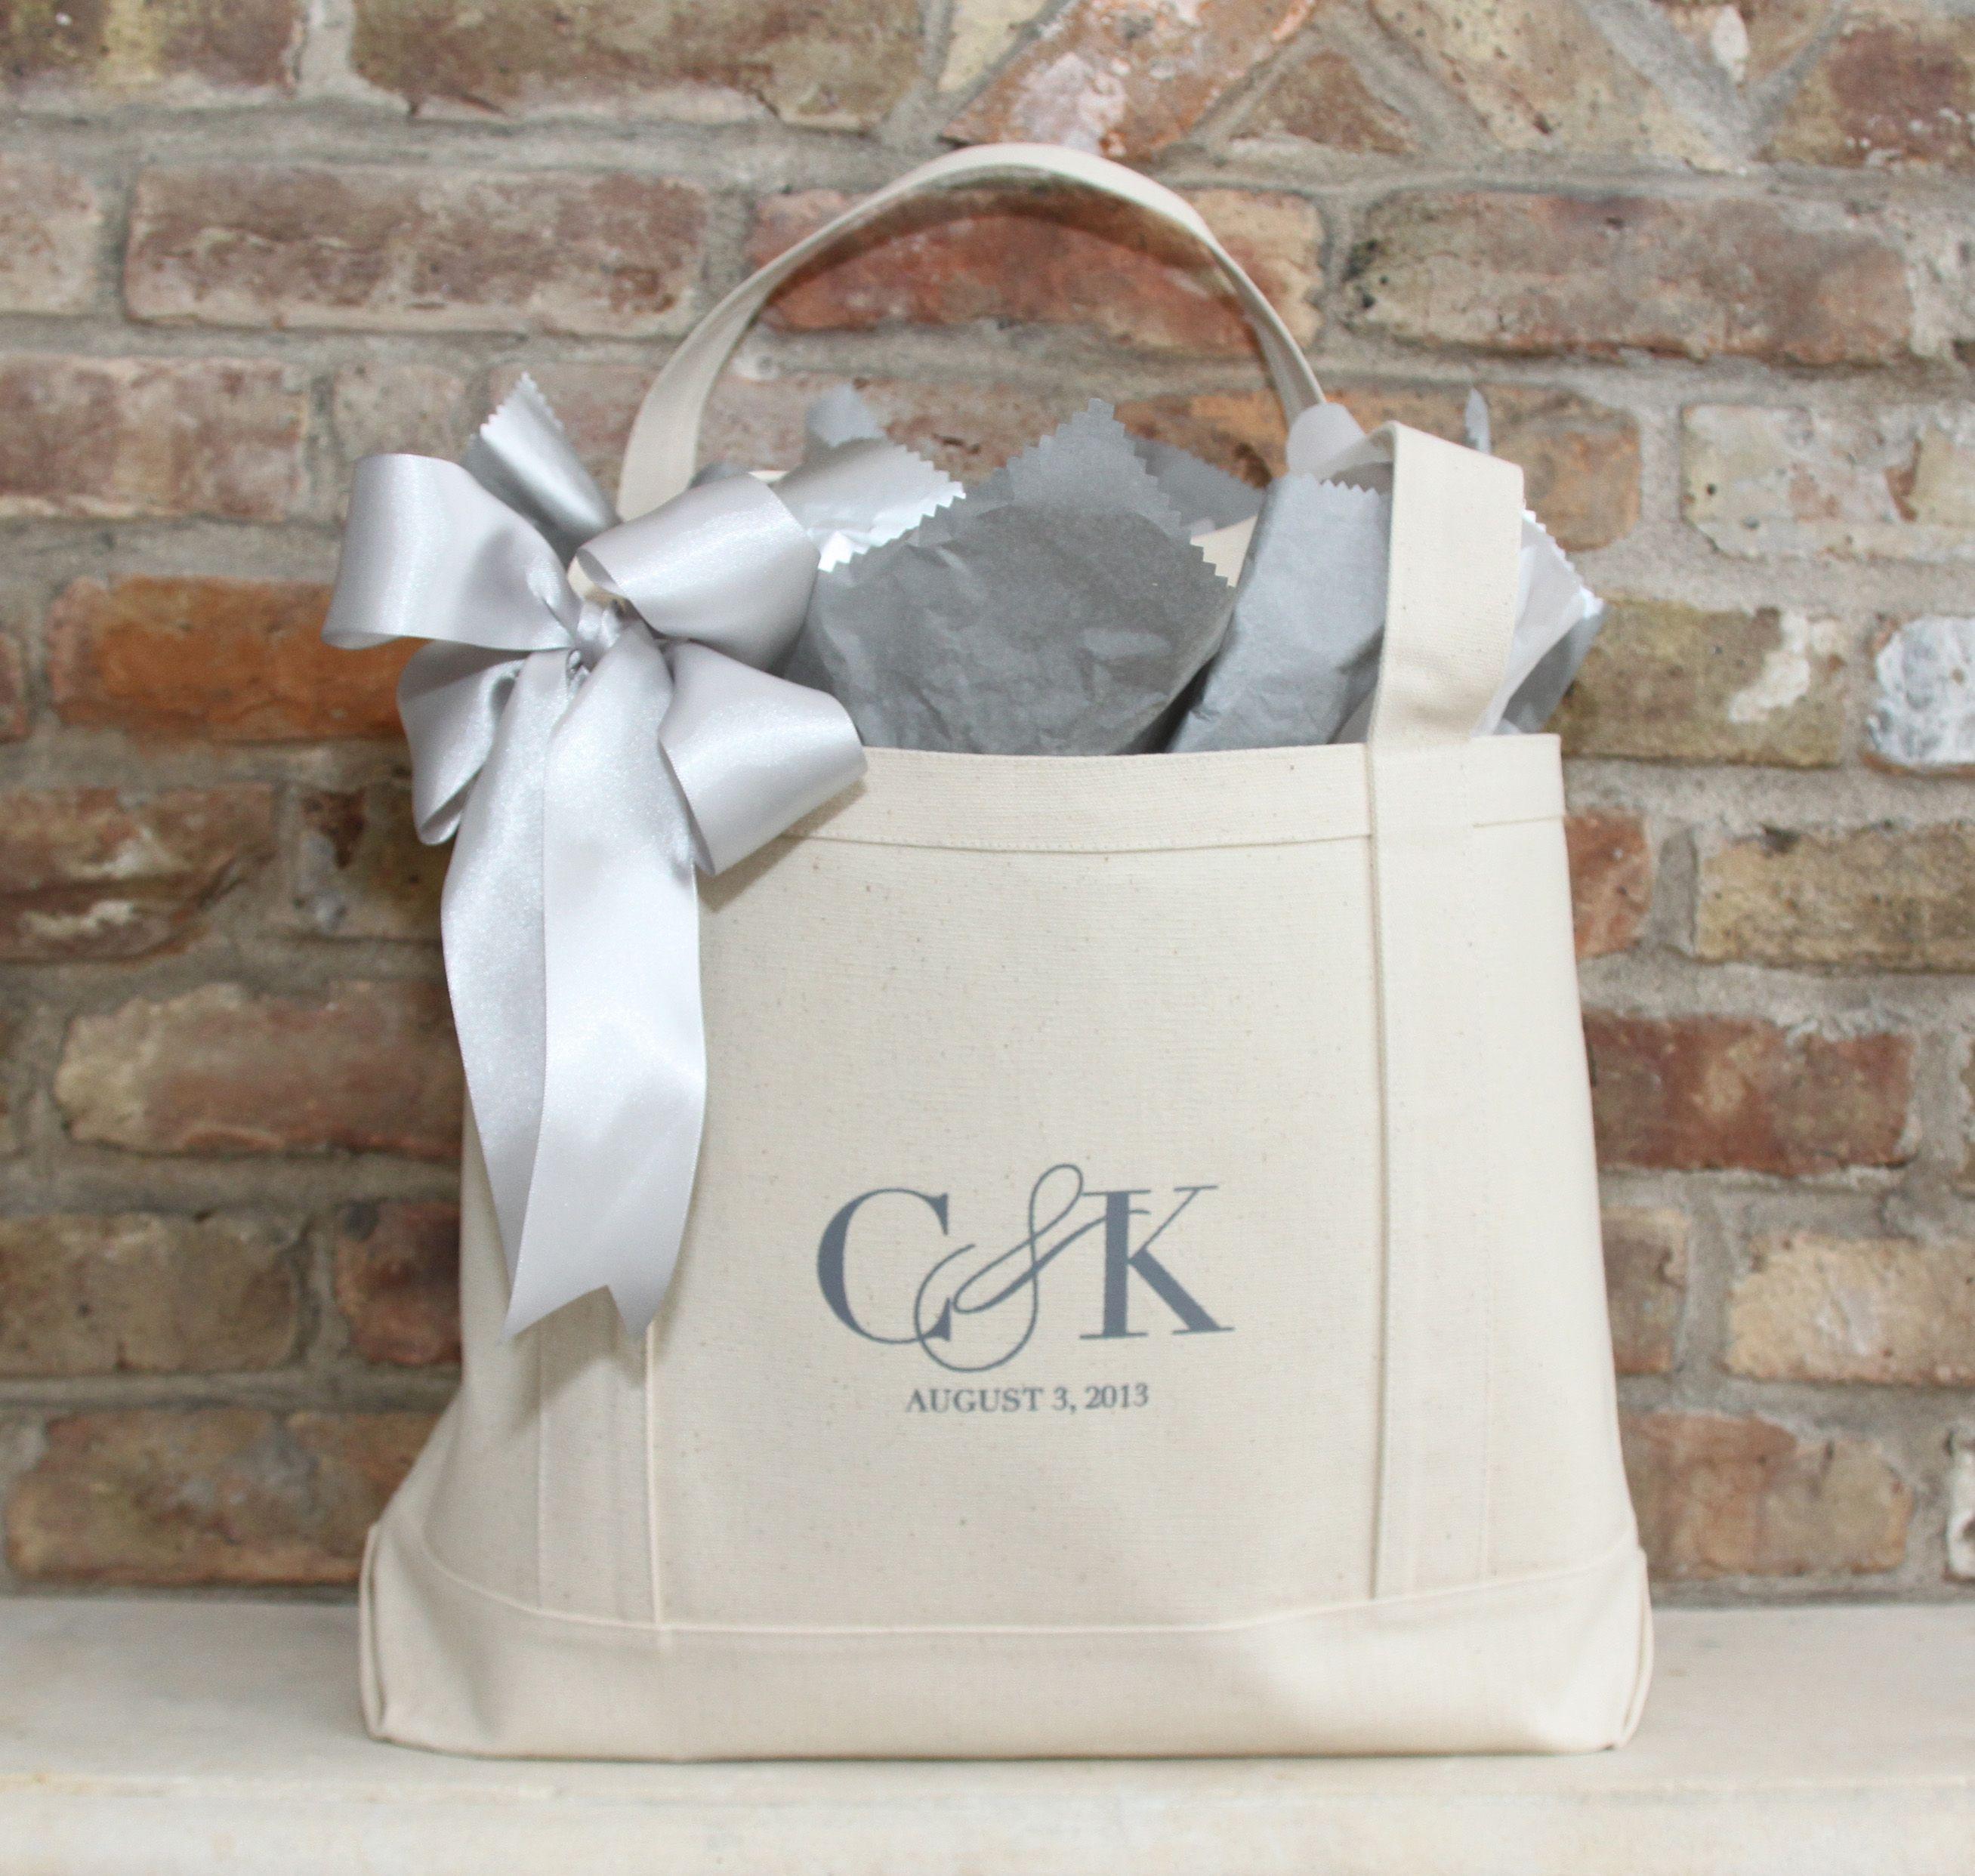 Bridal Shower Gift Idea // Custom Tote Bags | wedding | Pinterest ...